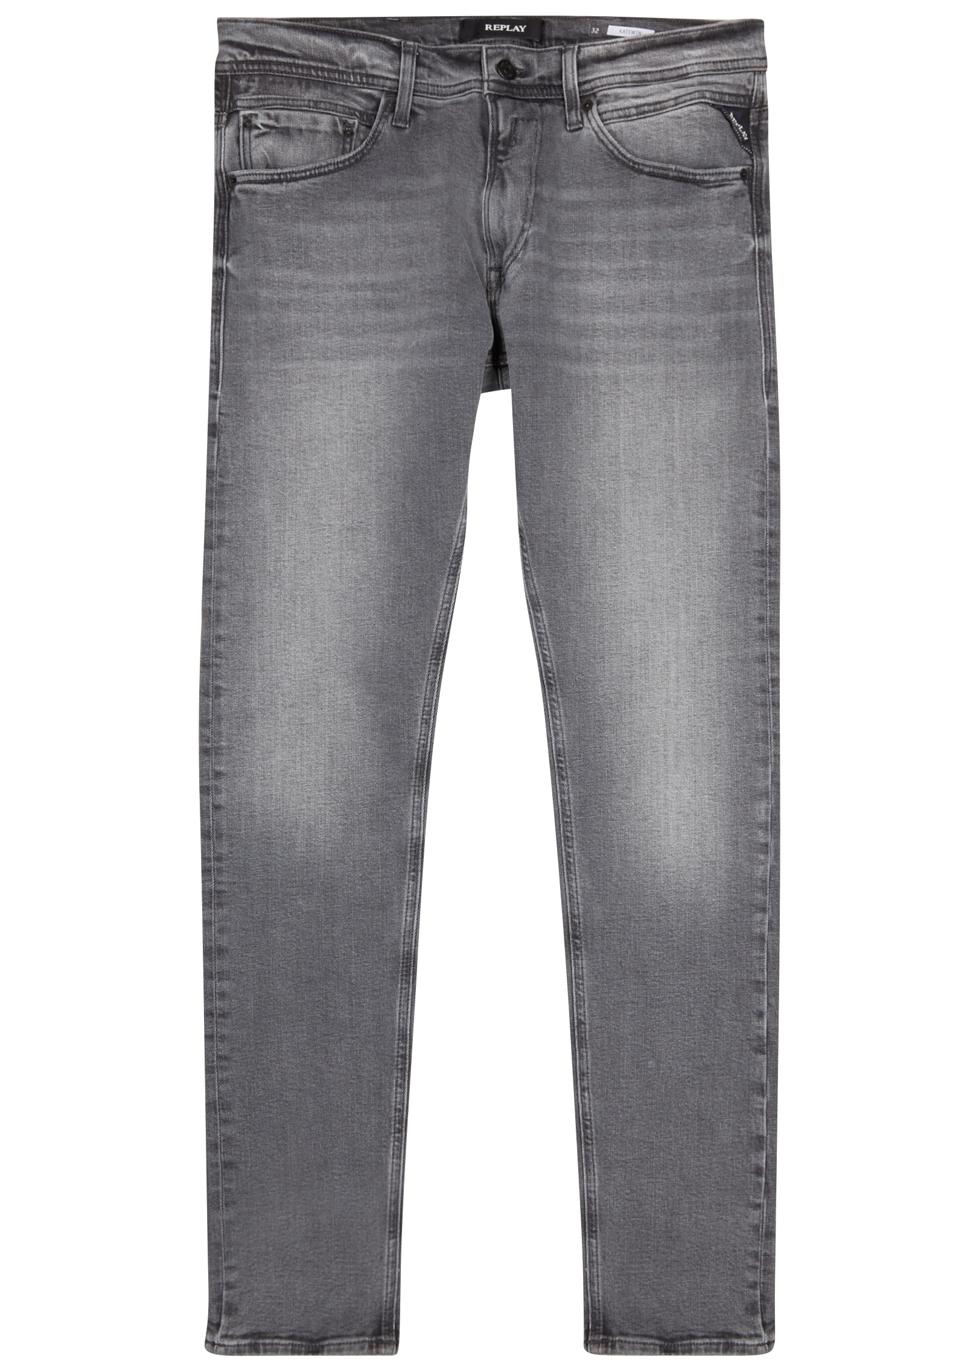 REPLAY Jondrill Hyperflex Grey Skinny Jeans